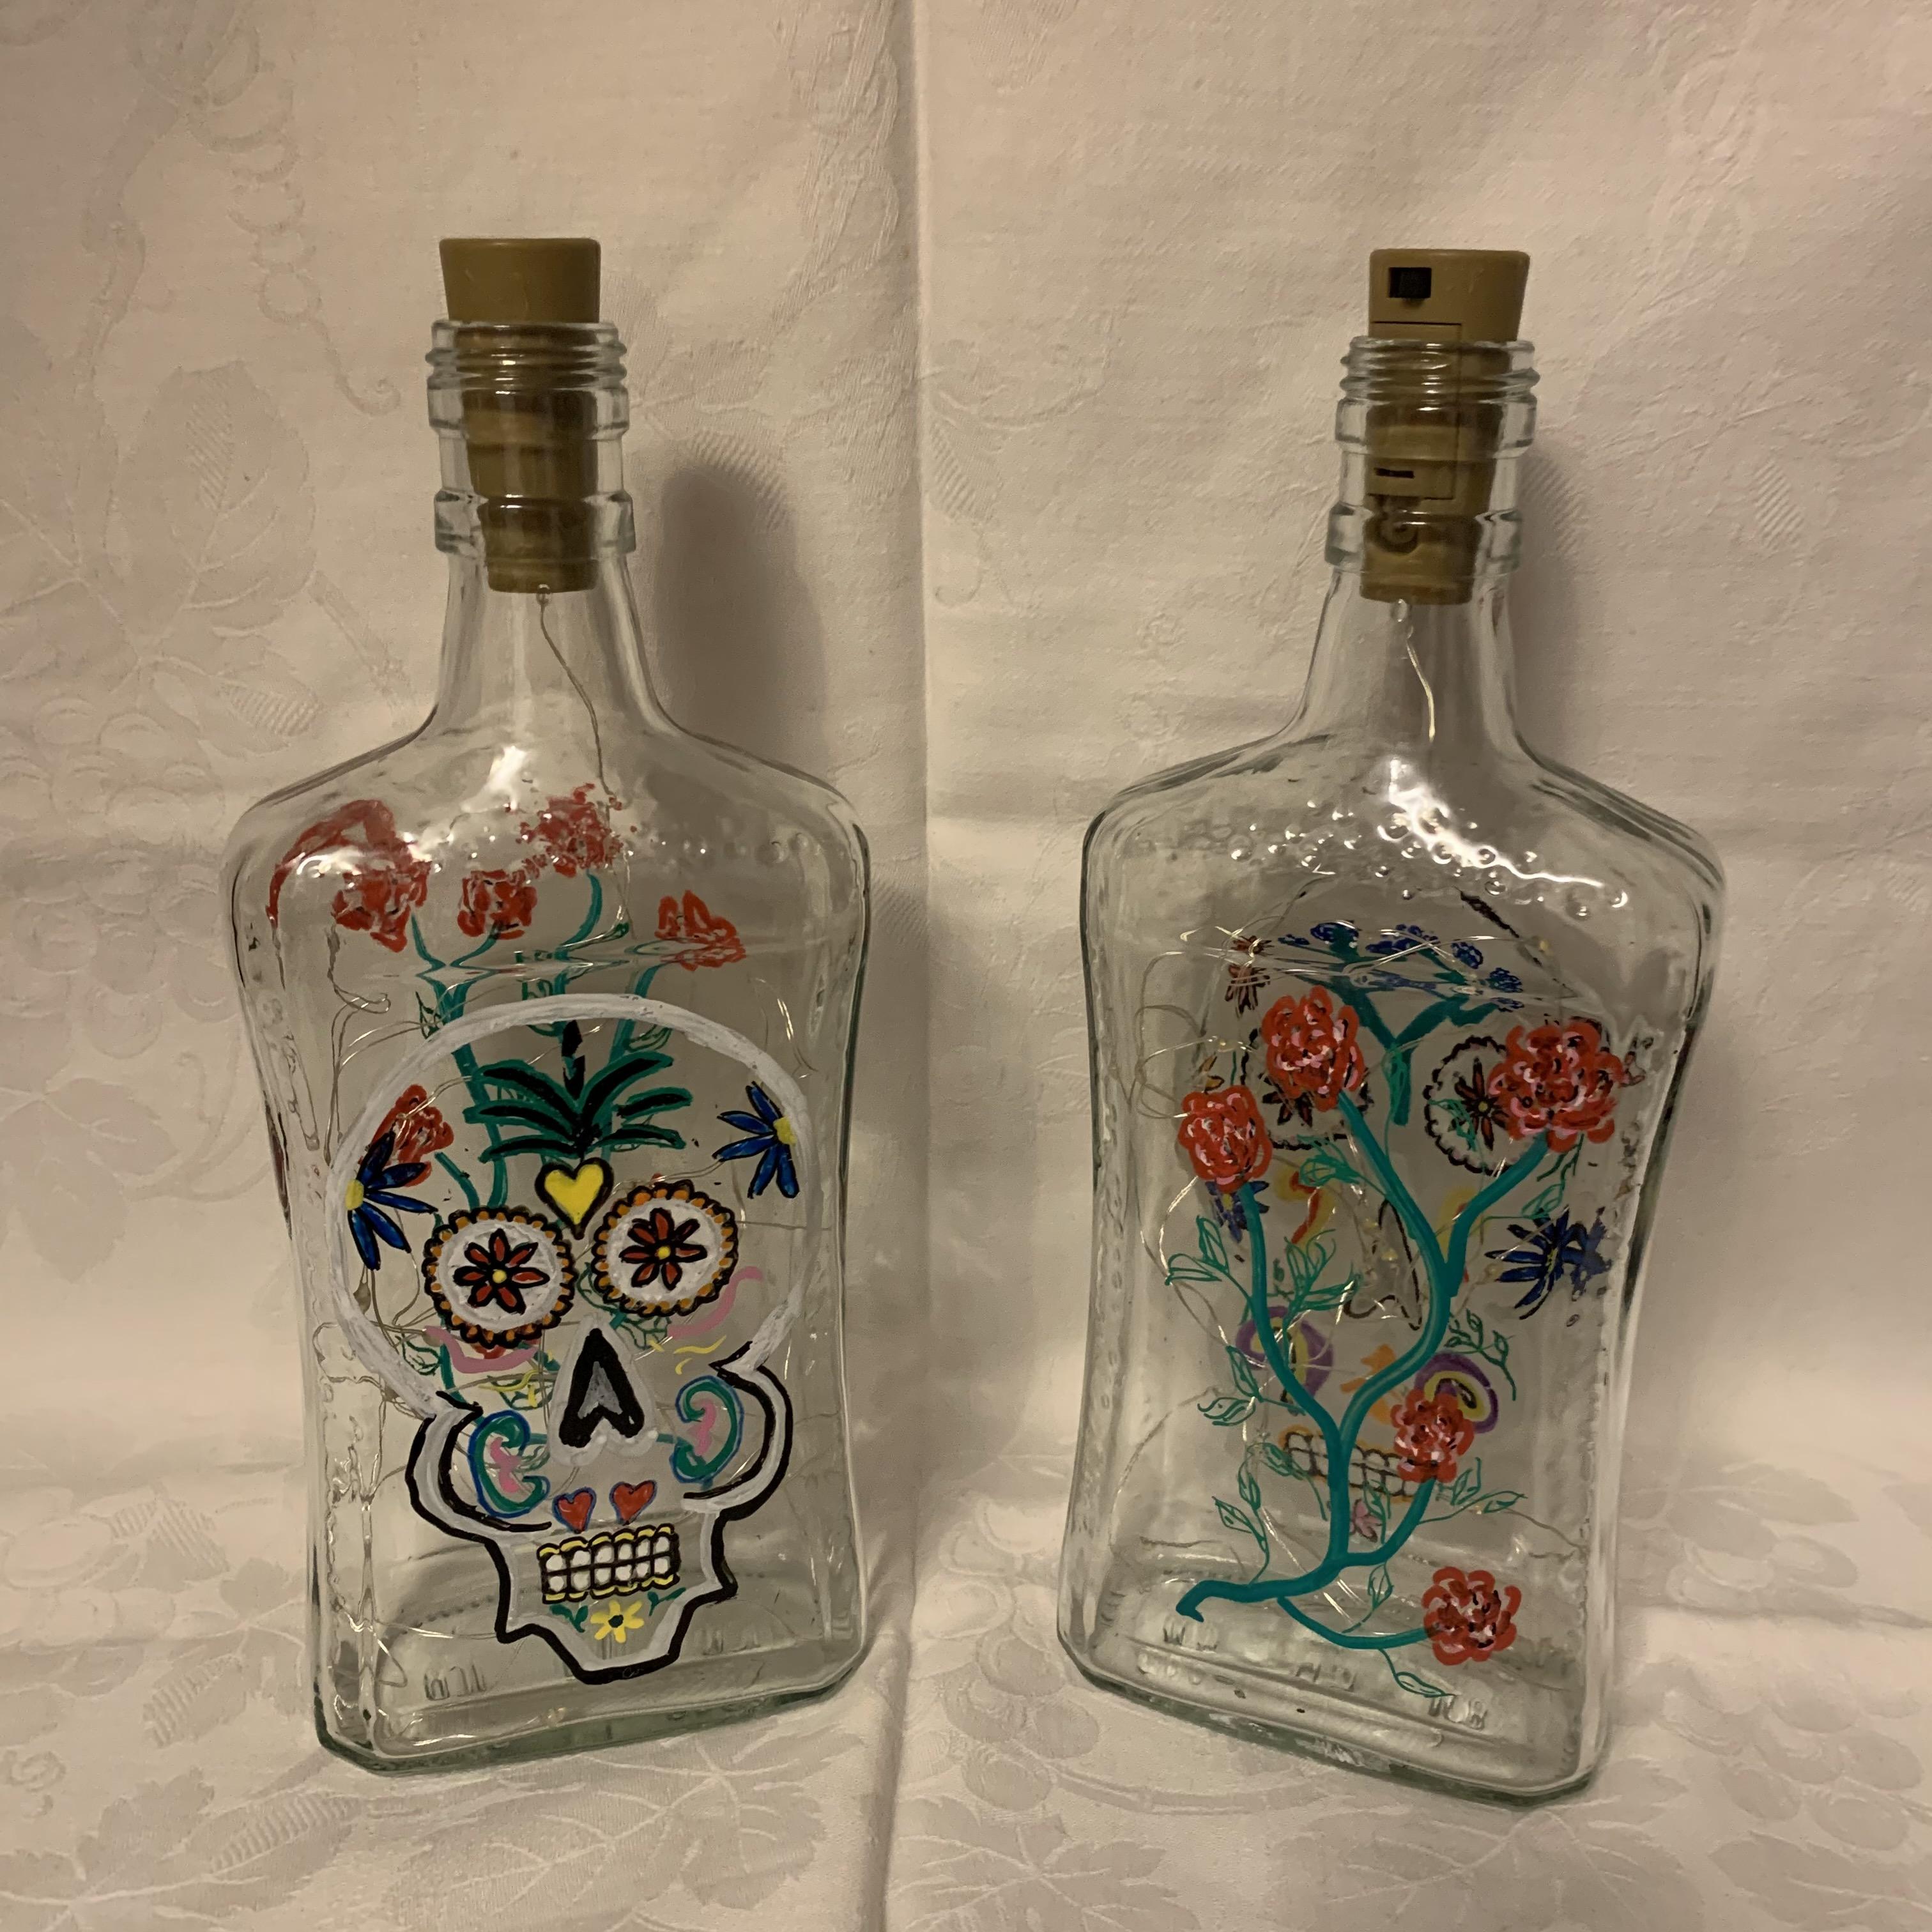 Bottle Day of the Dead C